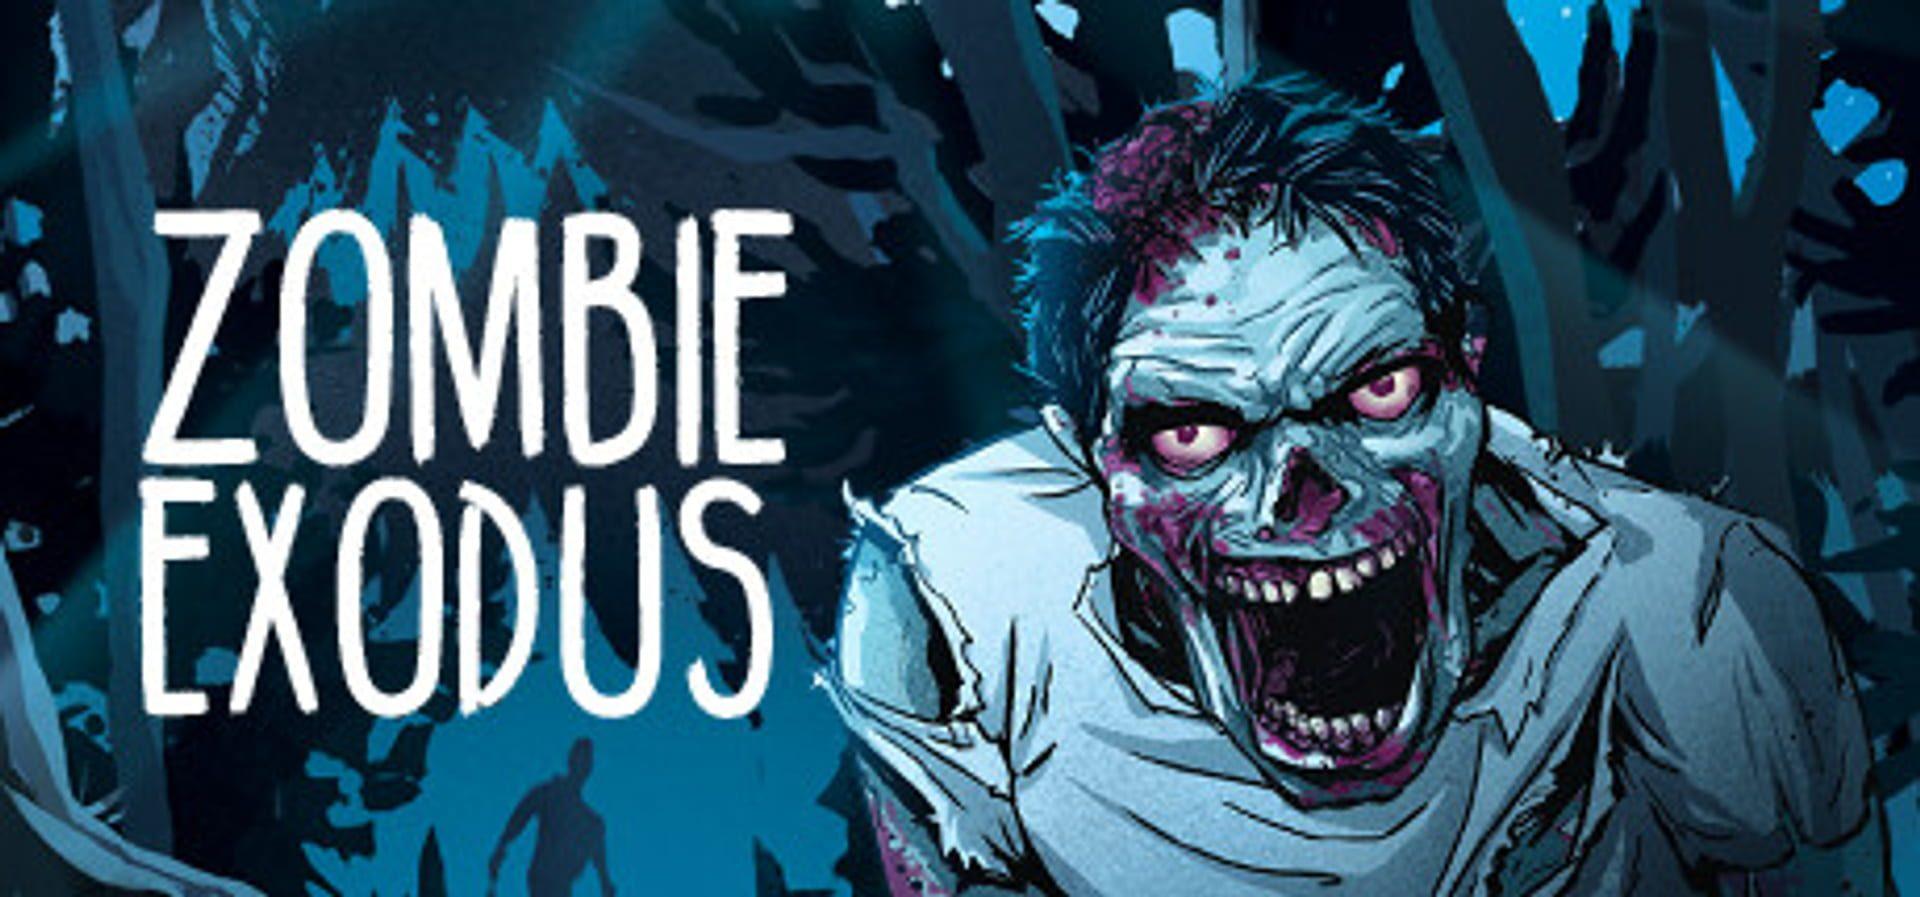 buy Zombie Exodus cd key for all platform